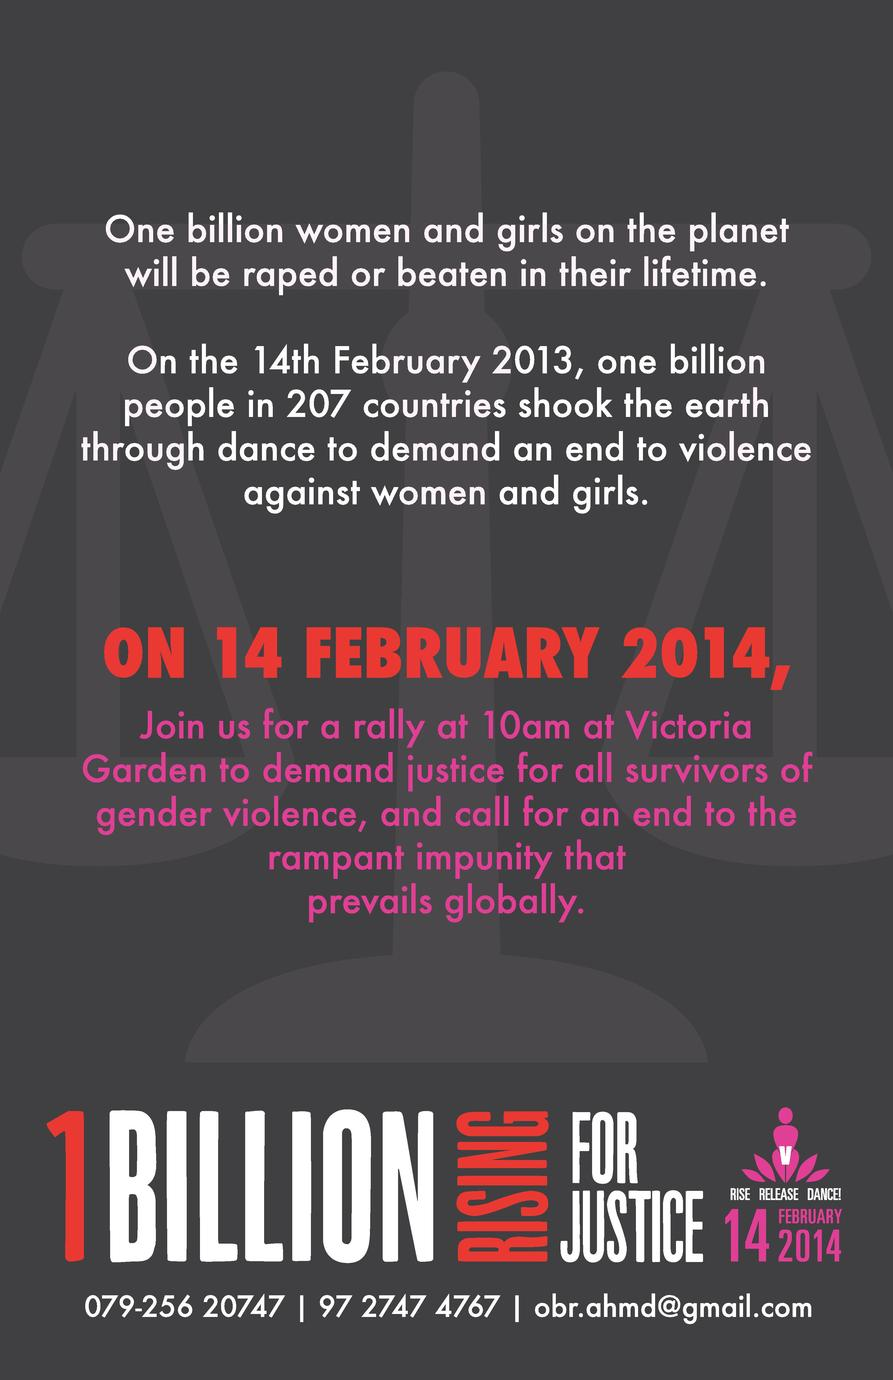 One billion women and girls